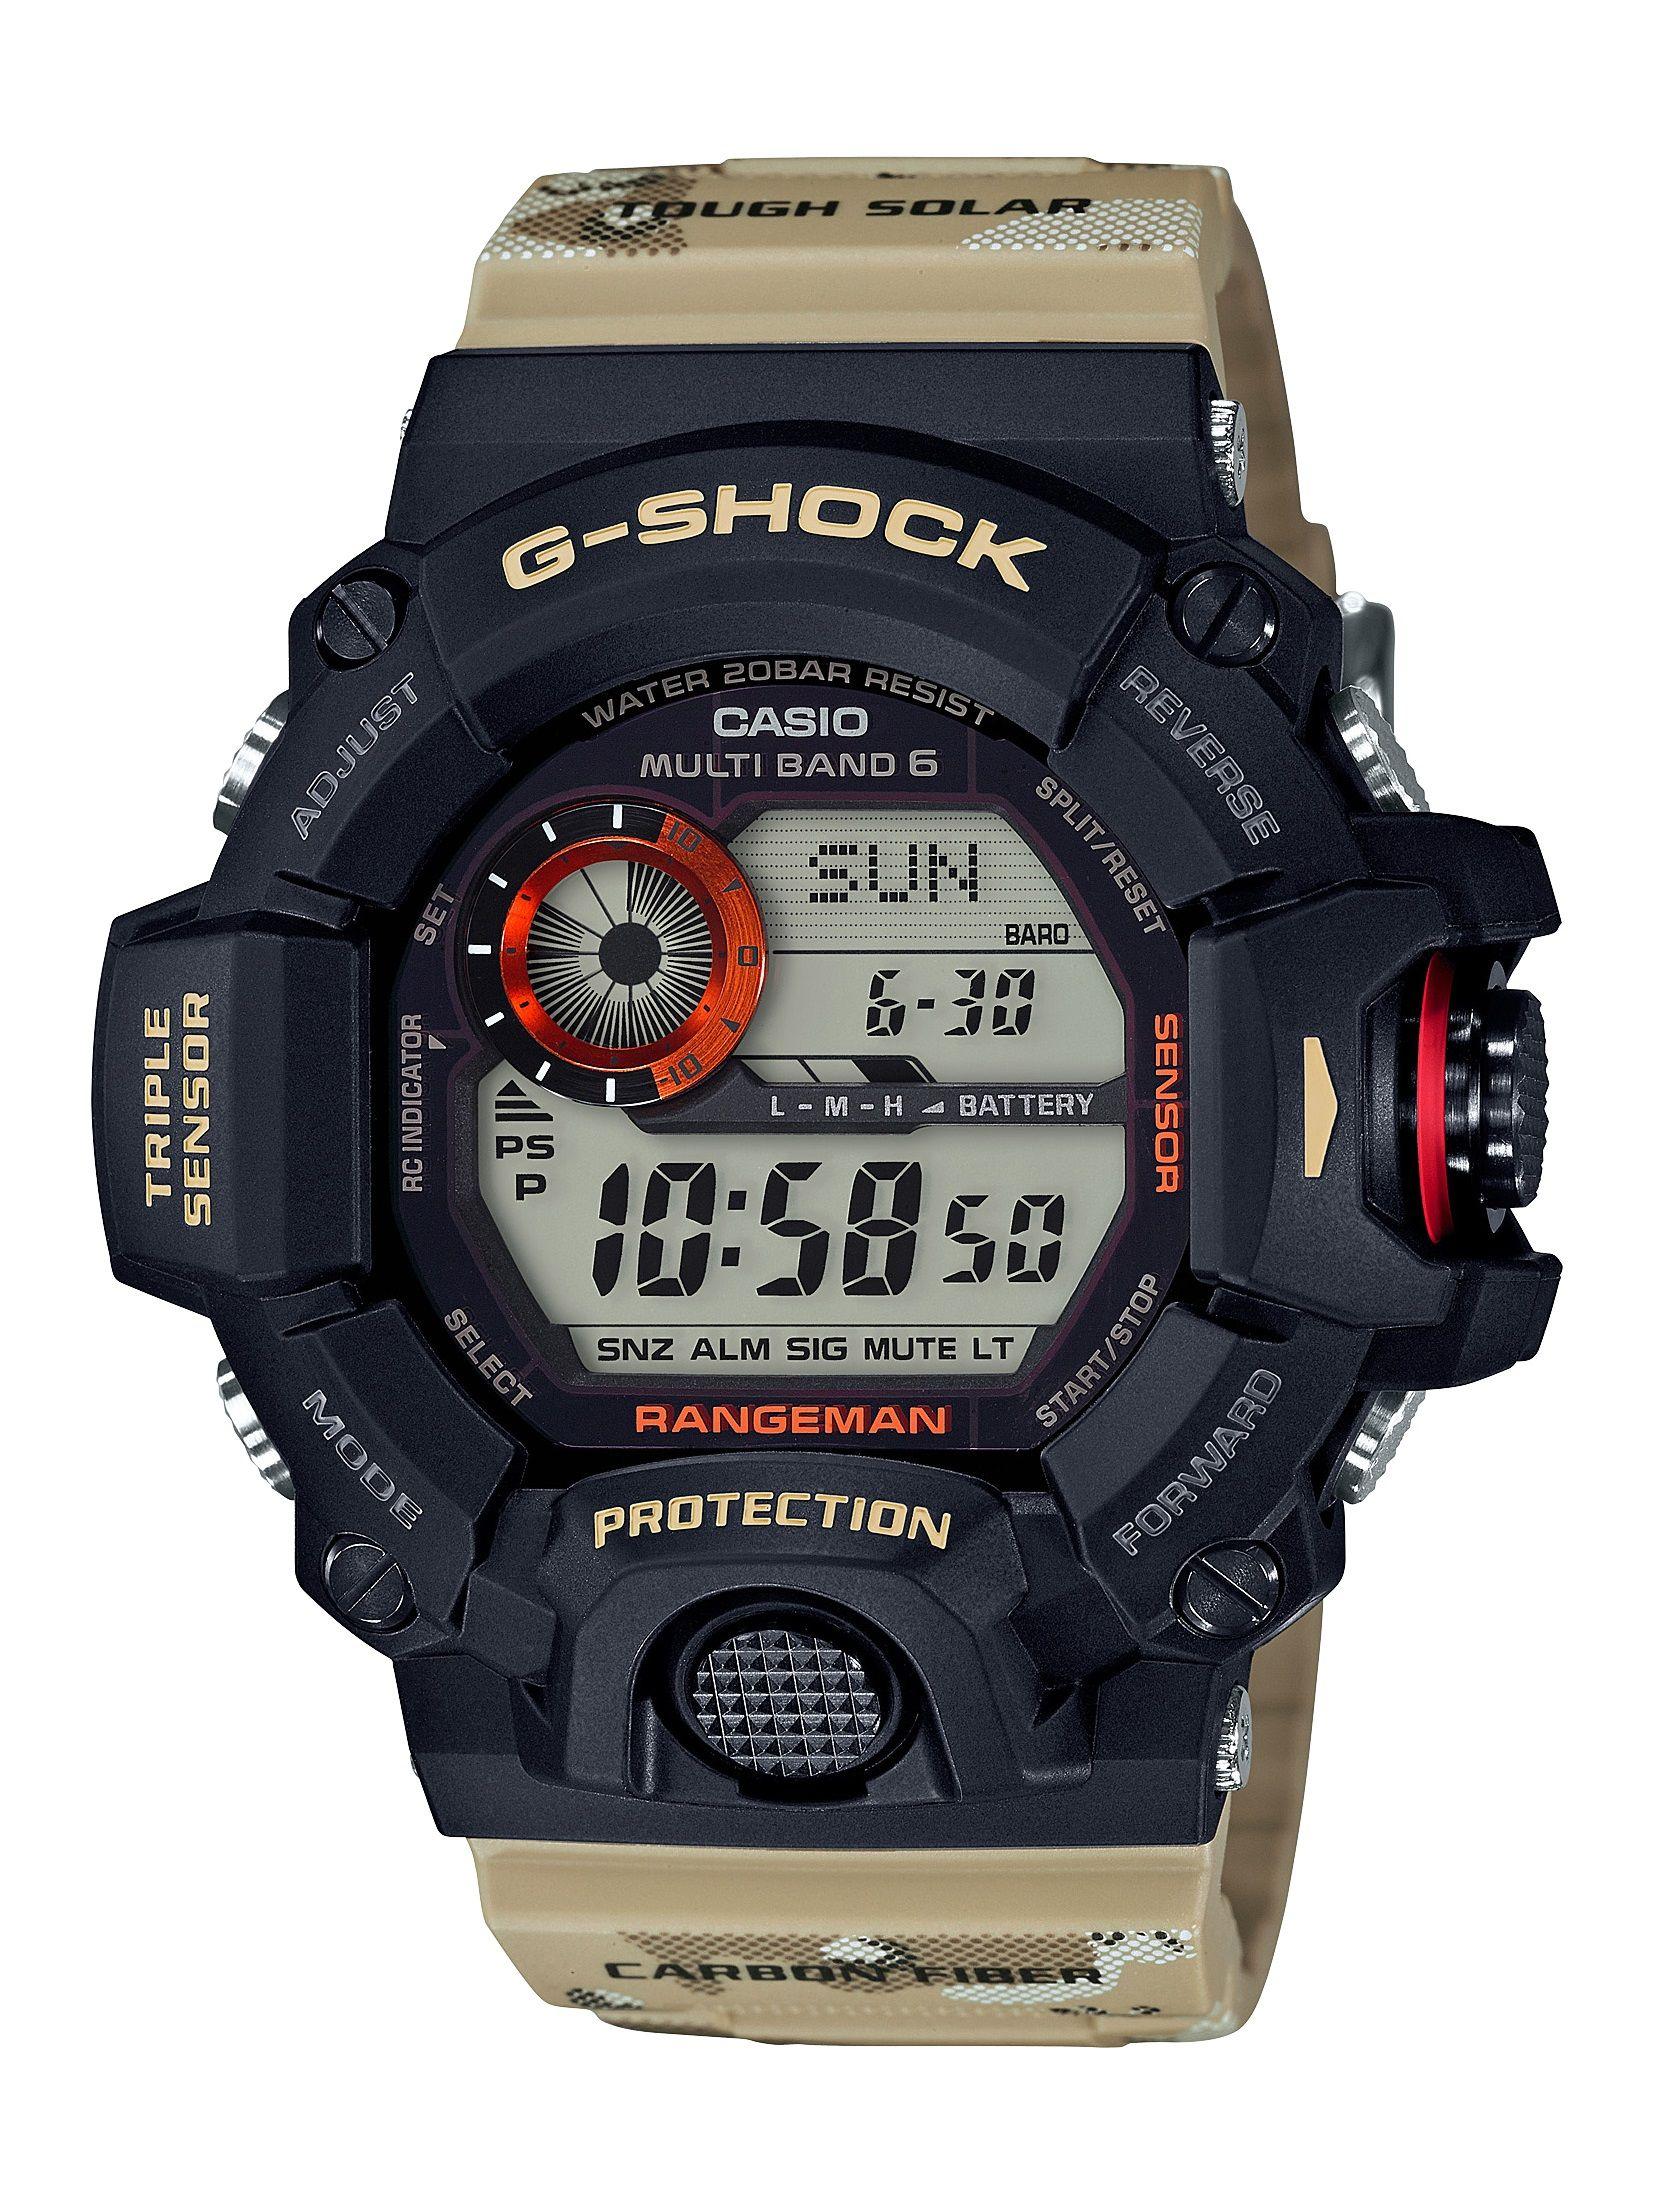 31fd1af14b8 RANGEMAN GW9400DCJ-1 Casio G Shock Watches